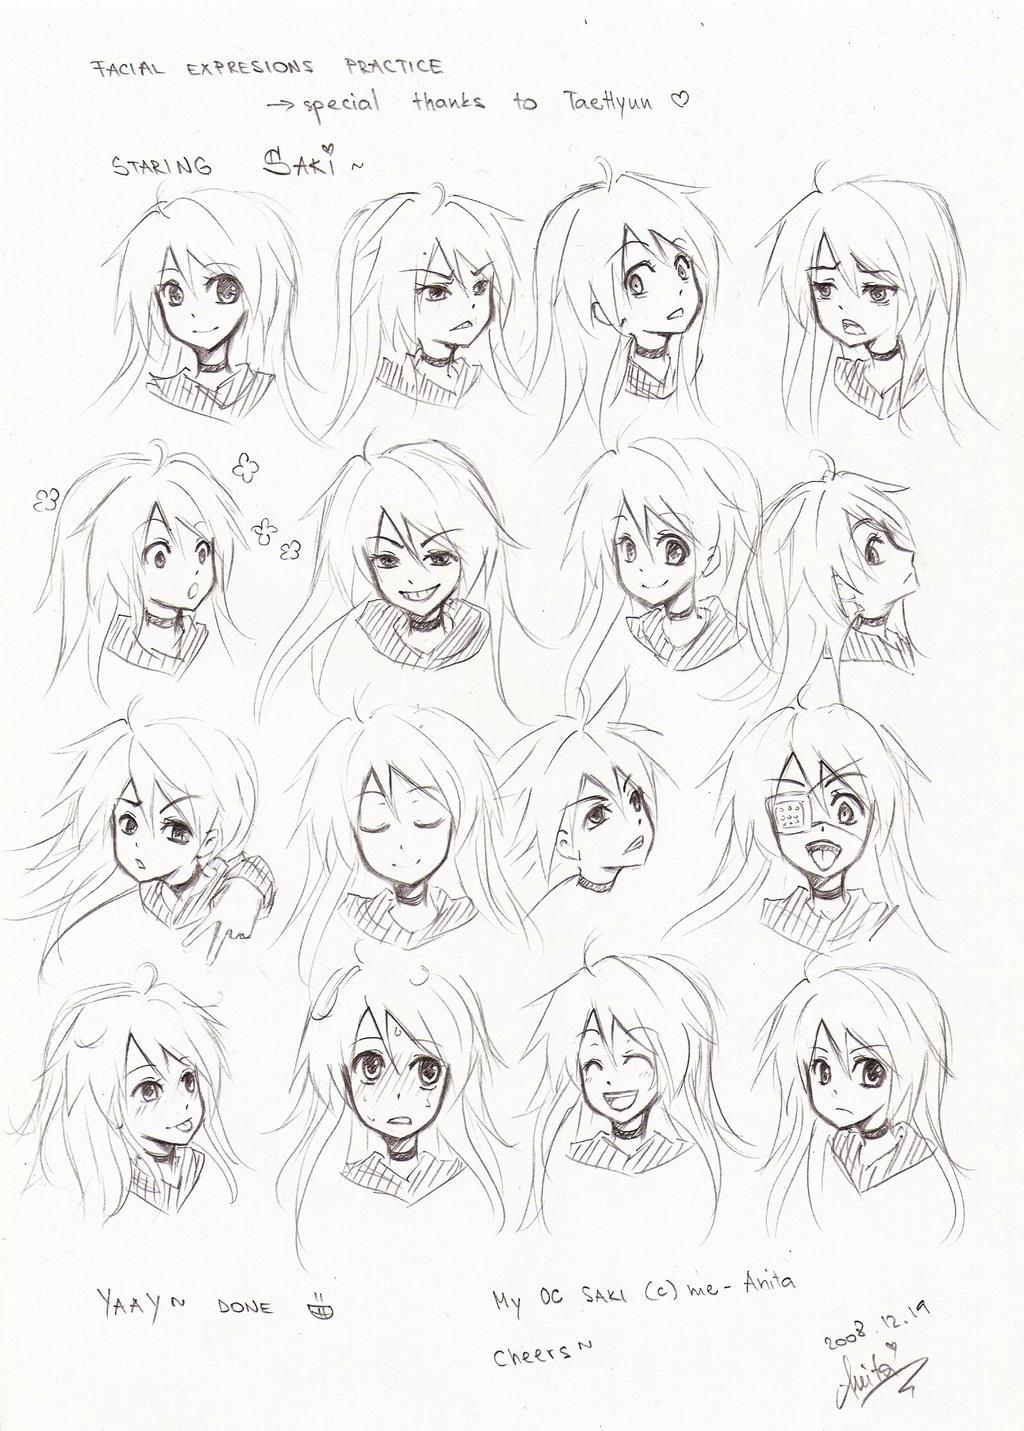 facial expressions practice by akiko-sama